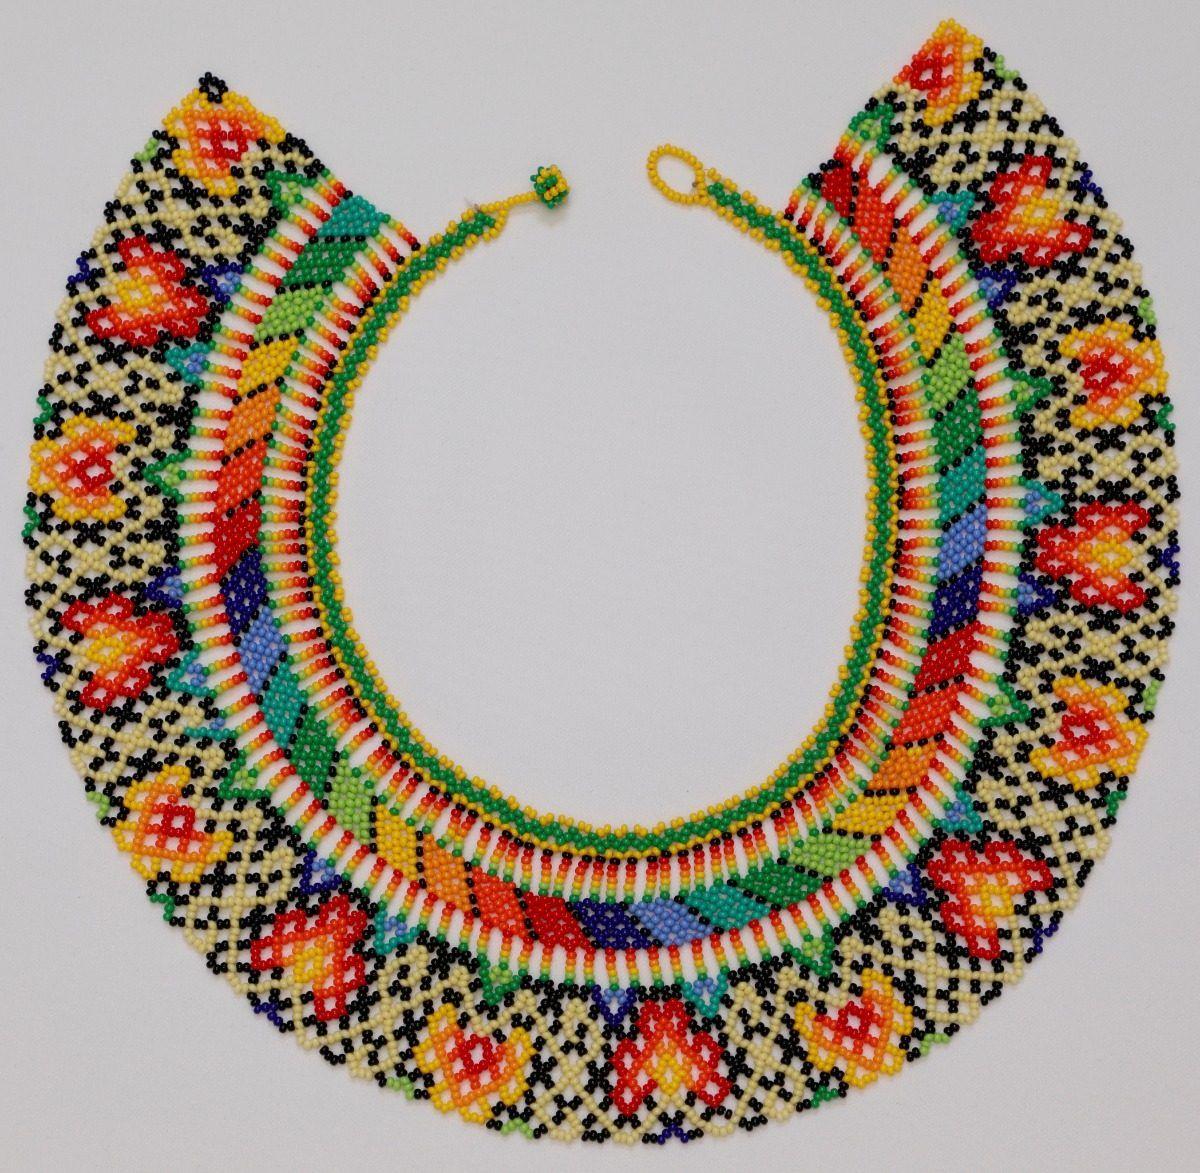 69afbdd892dd Collar Okama Artesanal Embera-chamí Mostacilla Chakira Mujer -   99.900 en Mercado  Libre